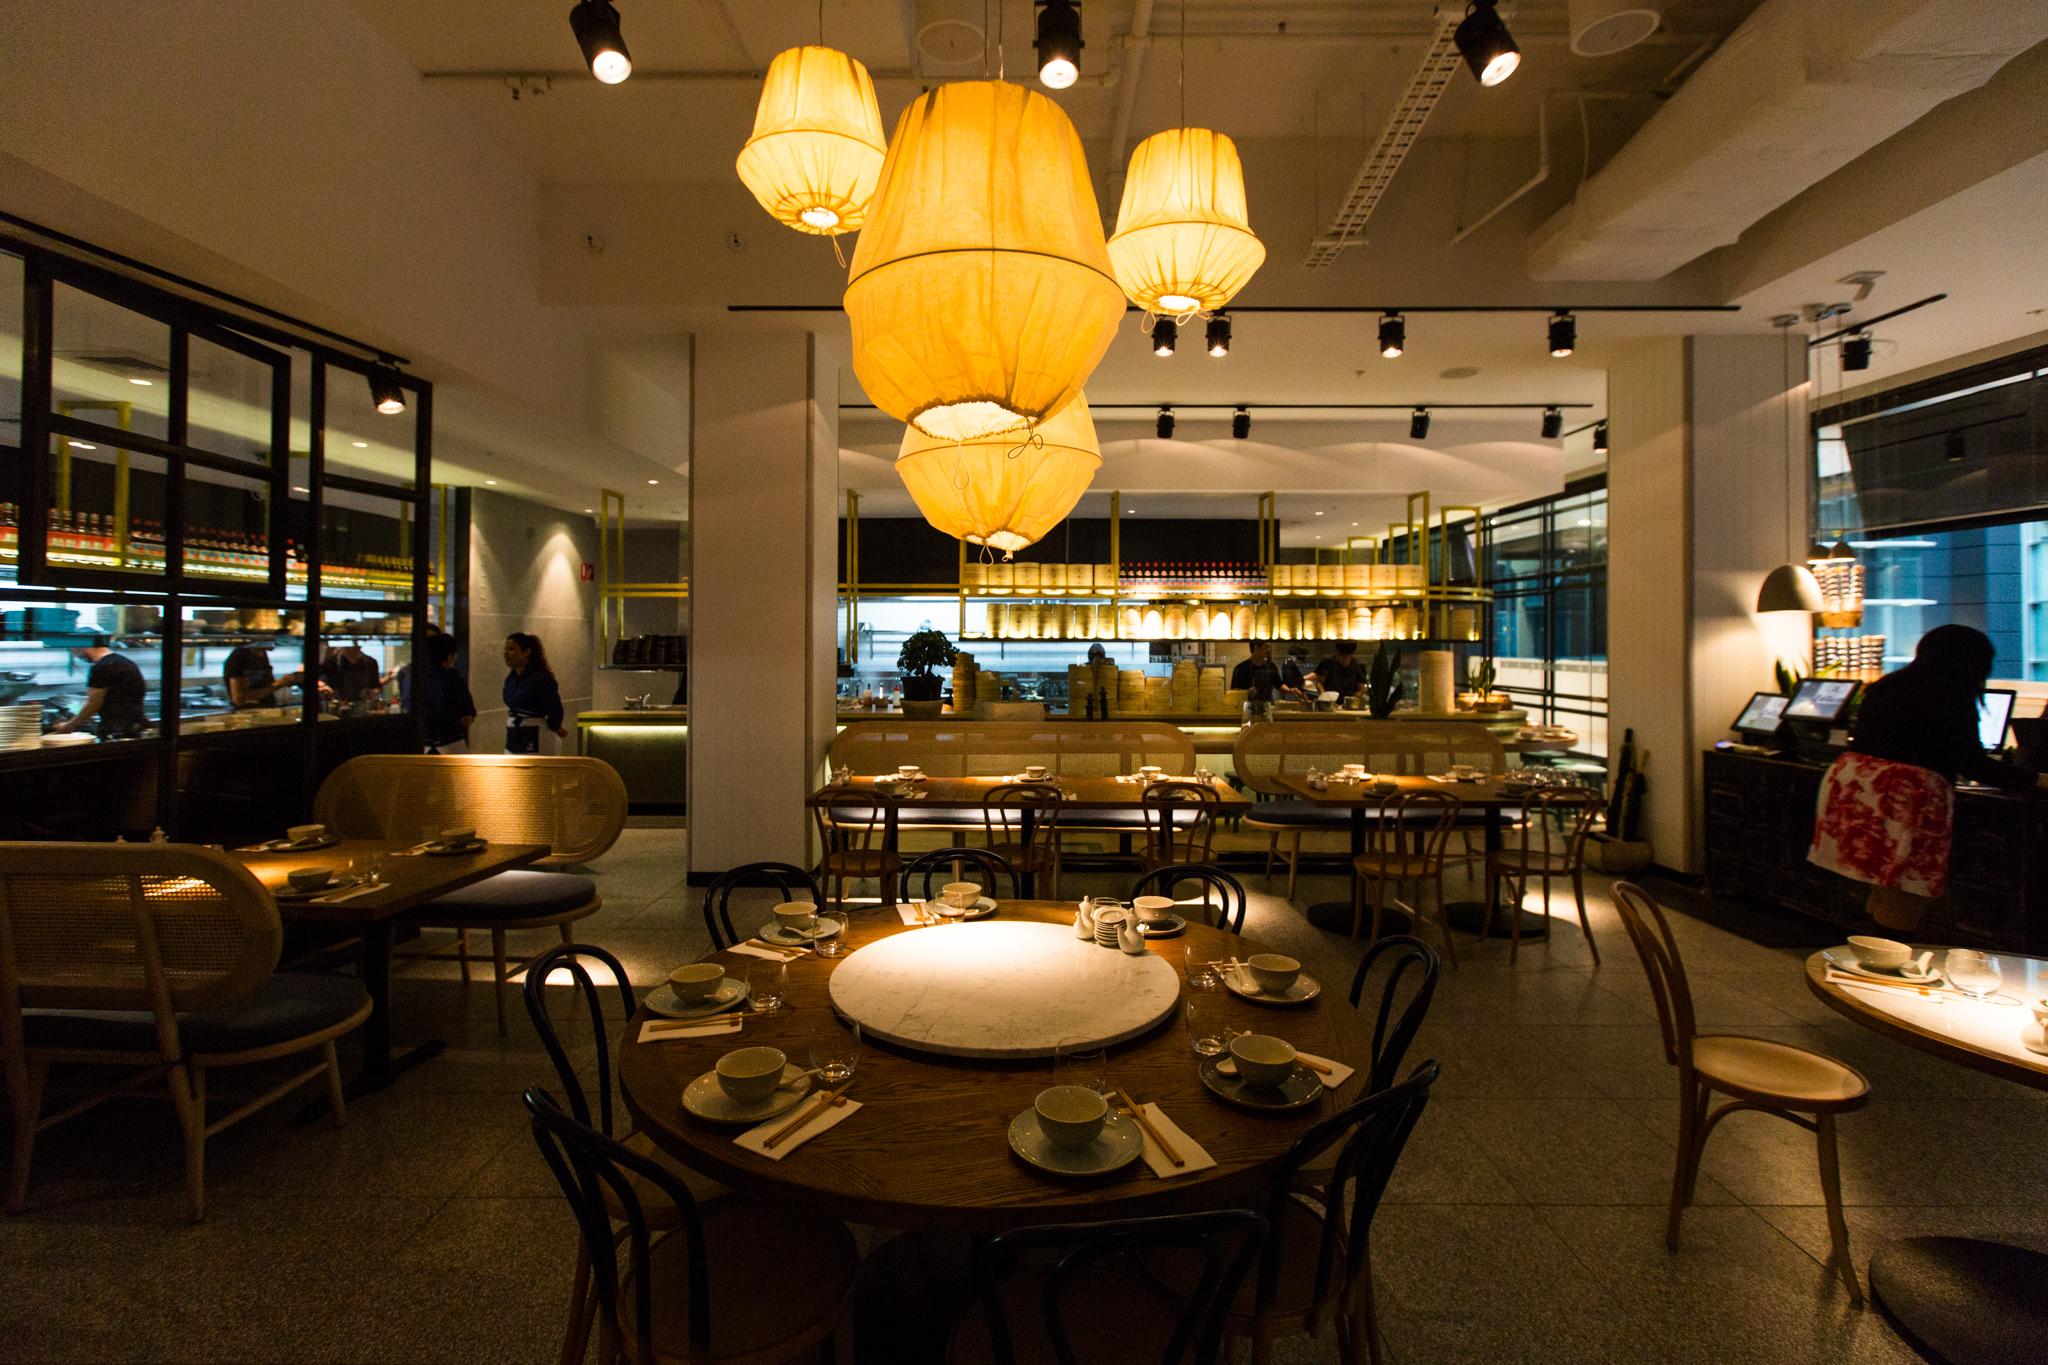 Lotus Restaurant The Galeries Sydney Unbearable